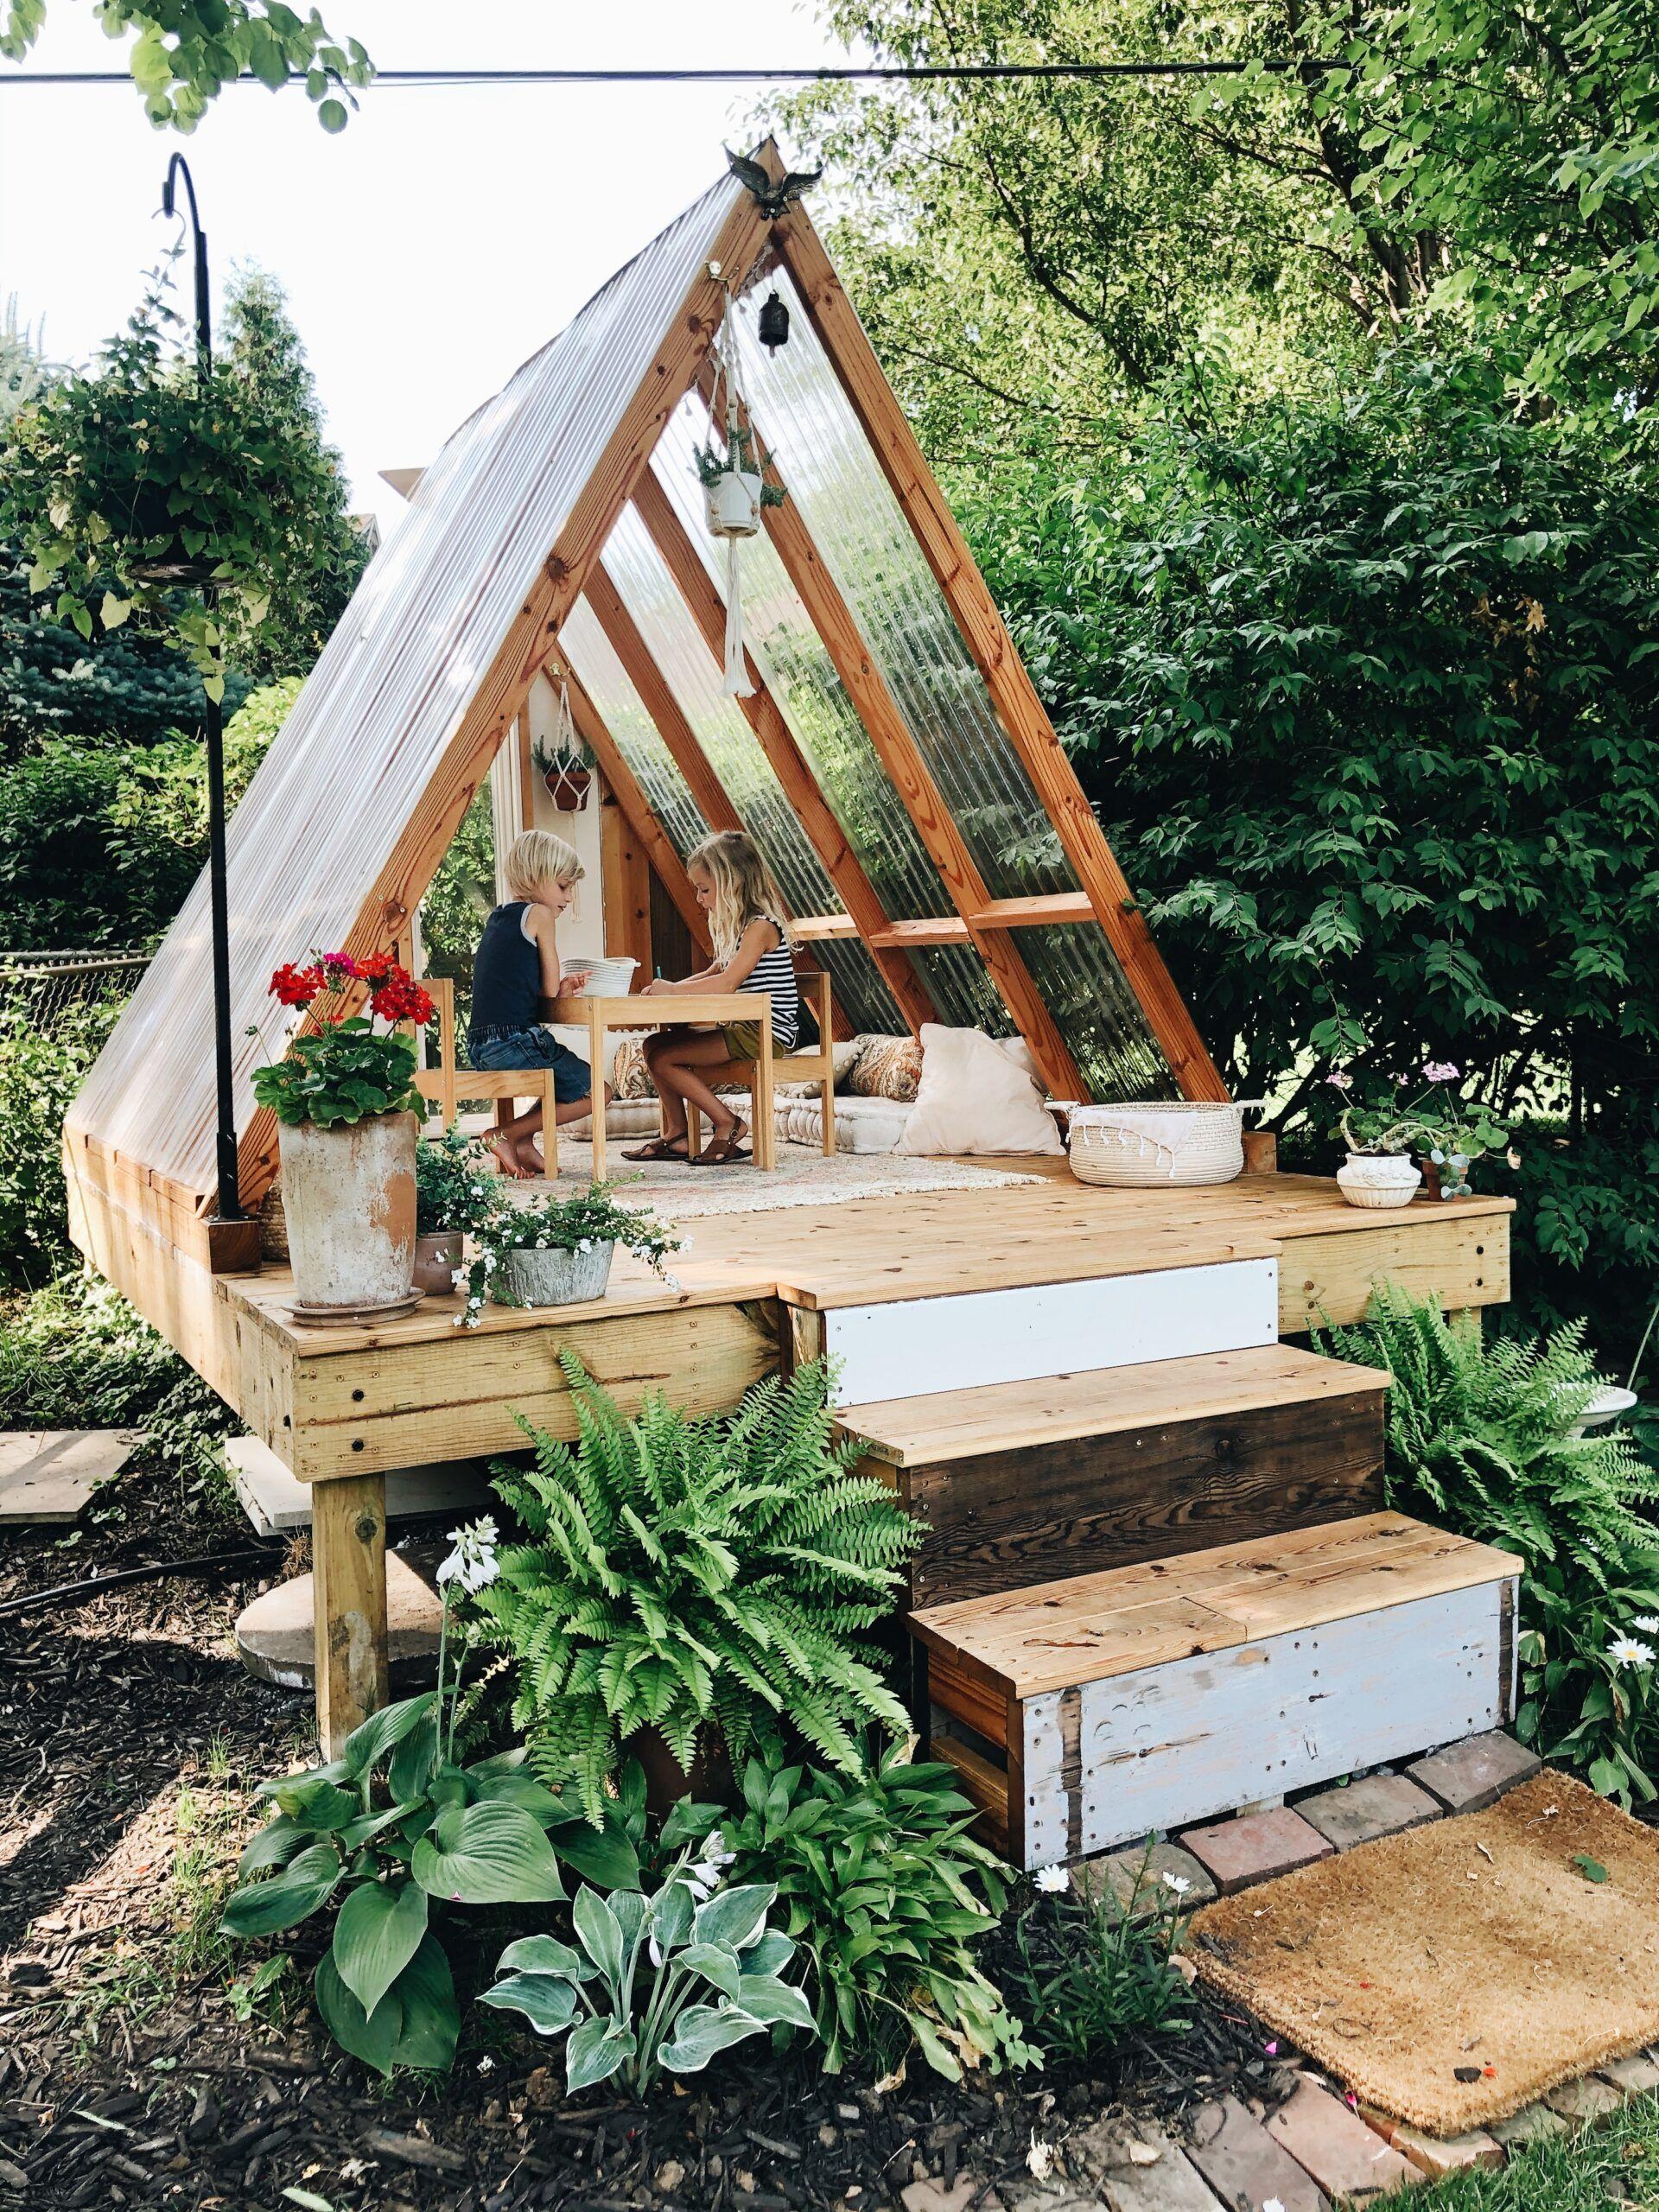 Summer's Canceled, So We Built a Playhouse